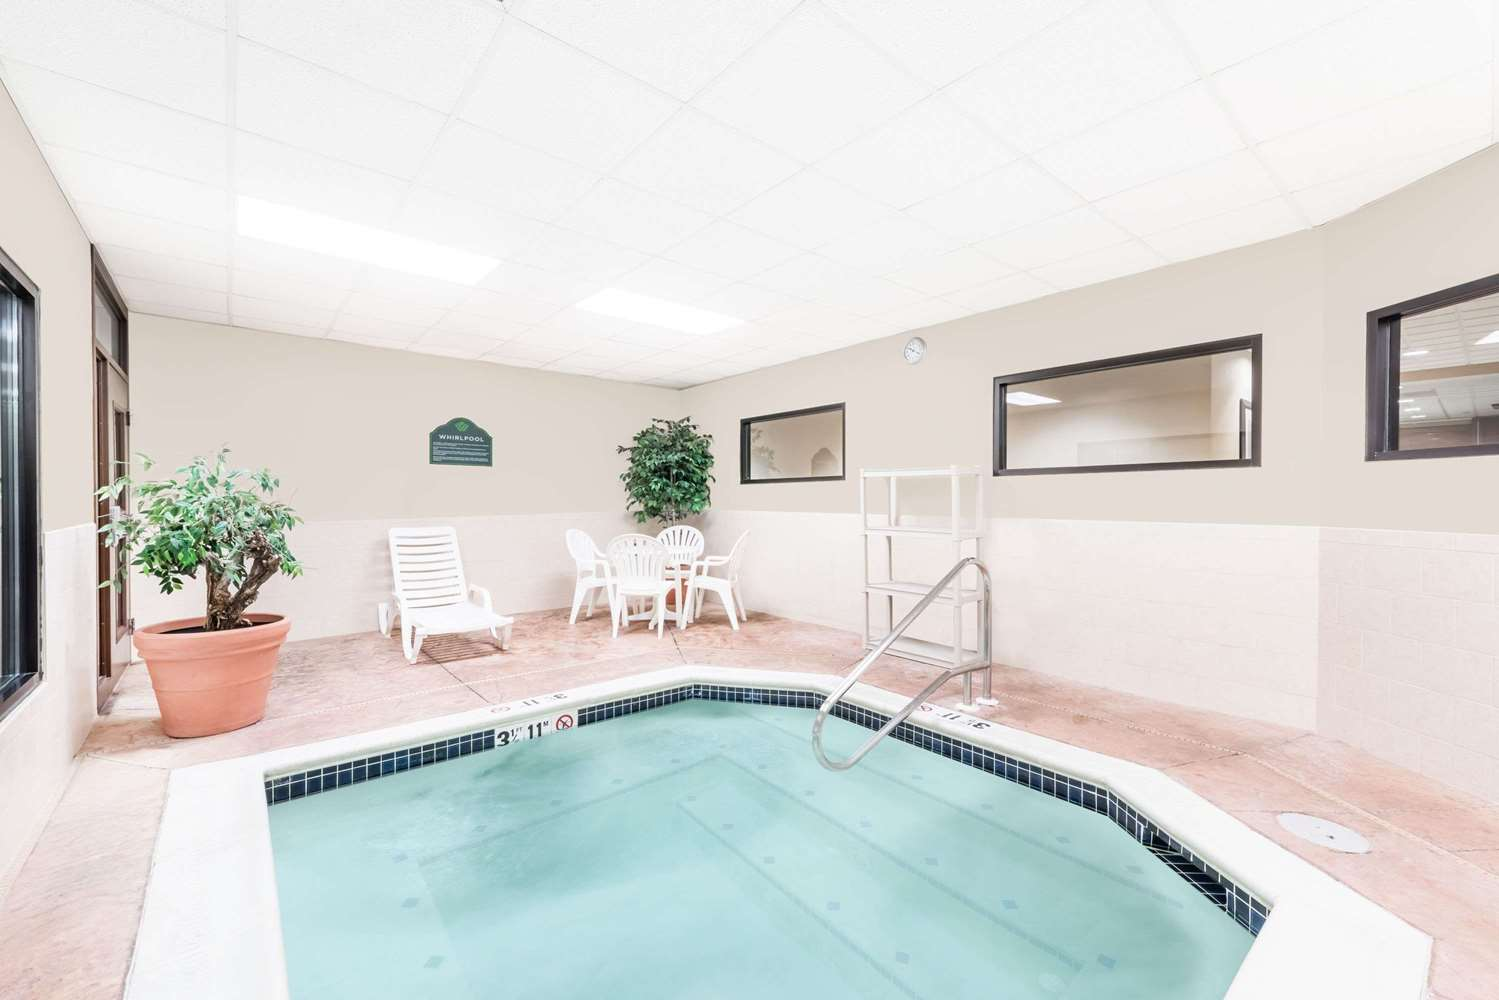 Pool - Wingate by Wyndham Hotel Lancaster